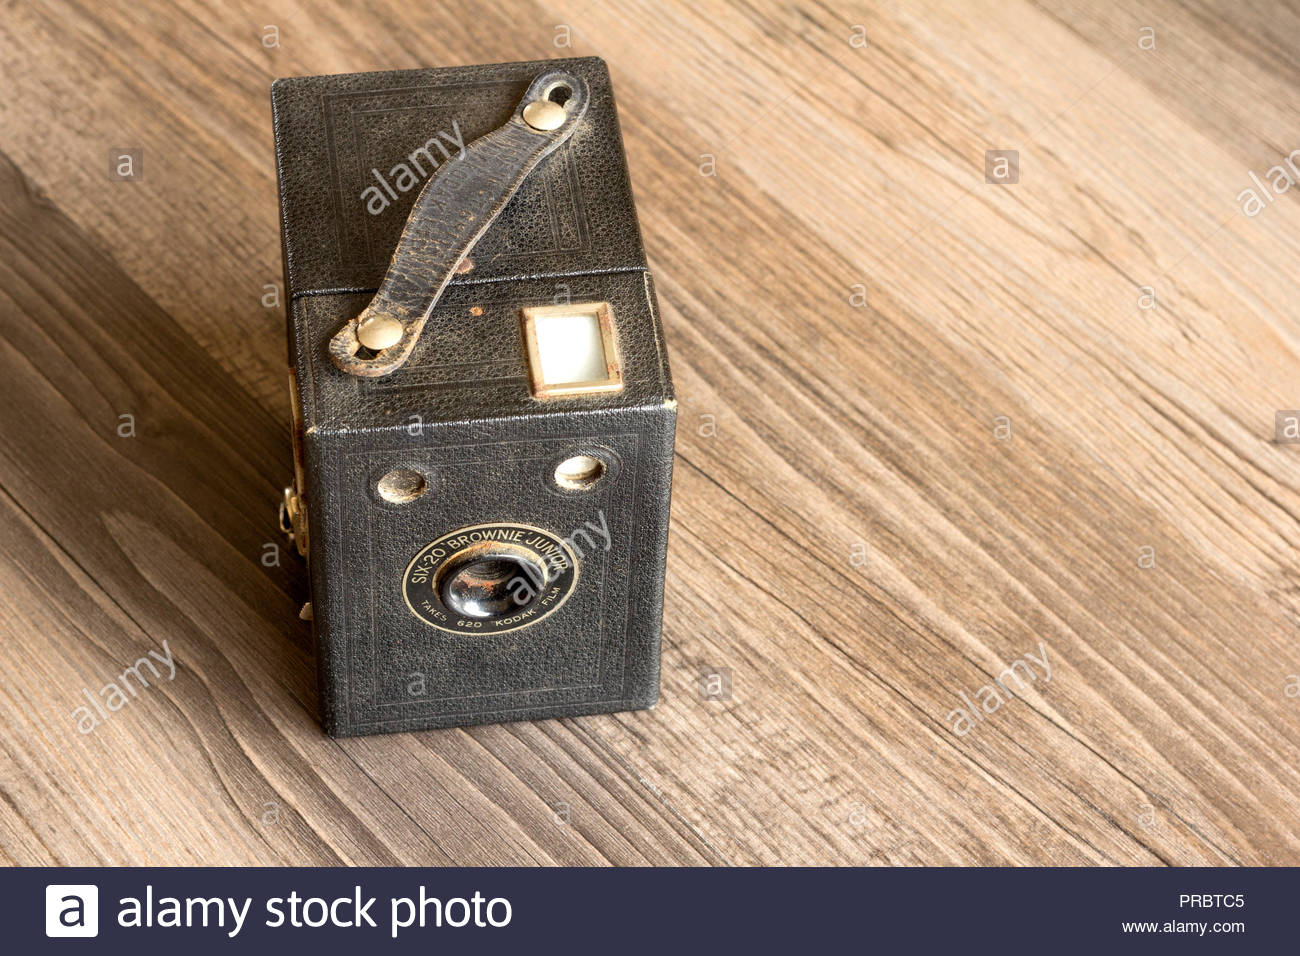 Kodak Brownie Six-20 Junior camera - Stock Image